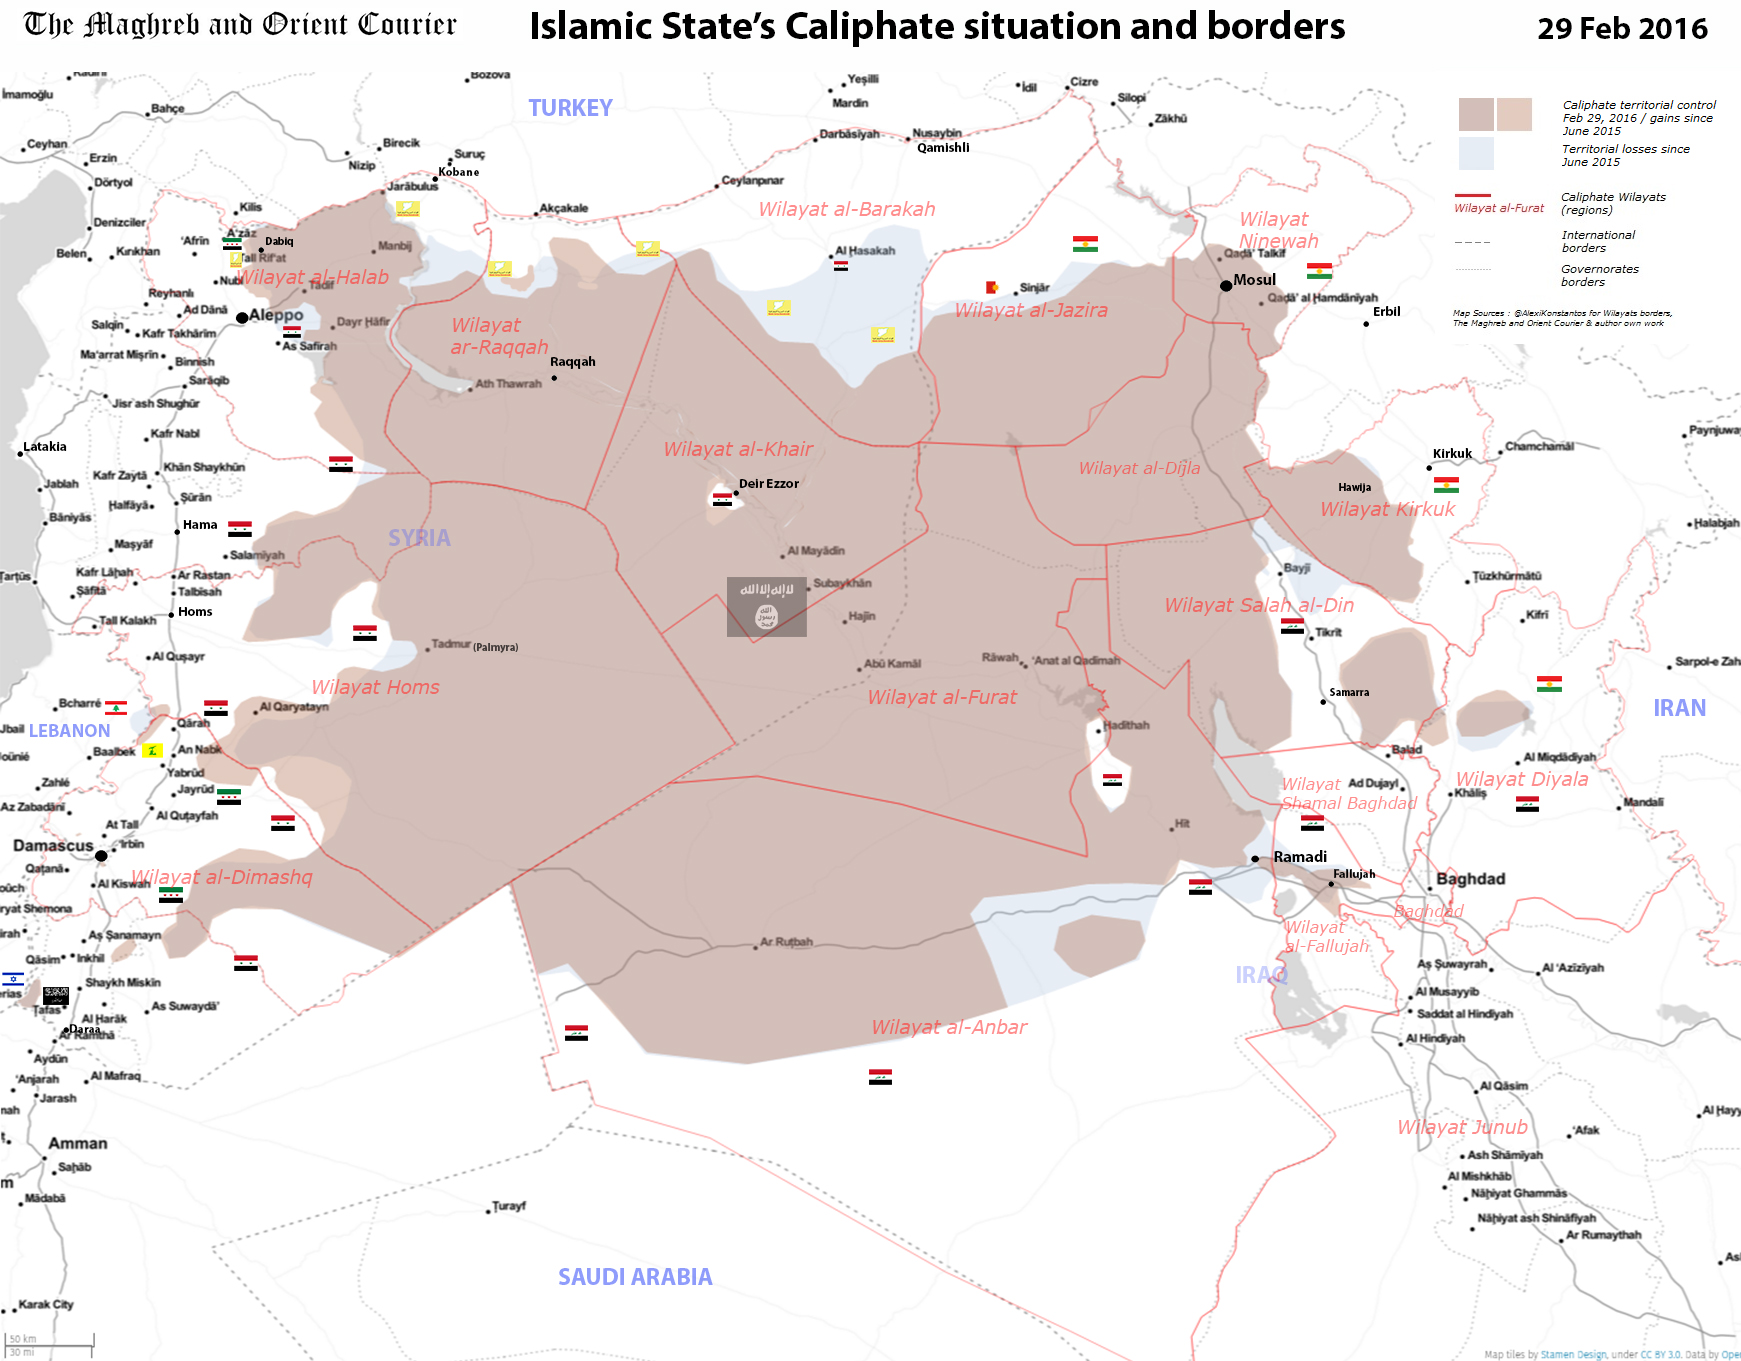 Новая карта расположения ИГИЛ на территории Сирии и Ирака от 15.02.2006